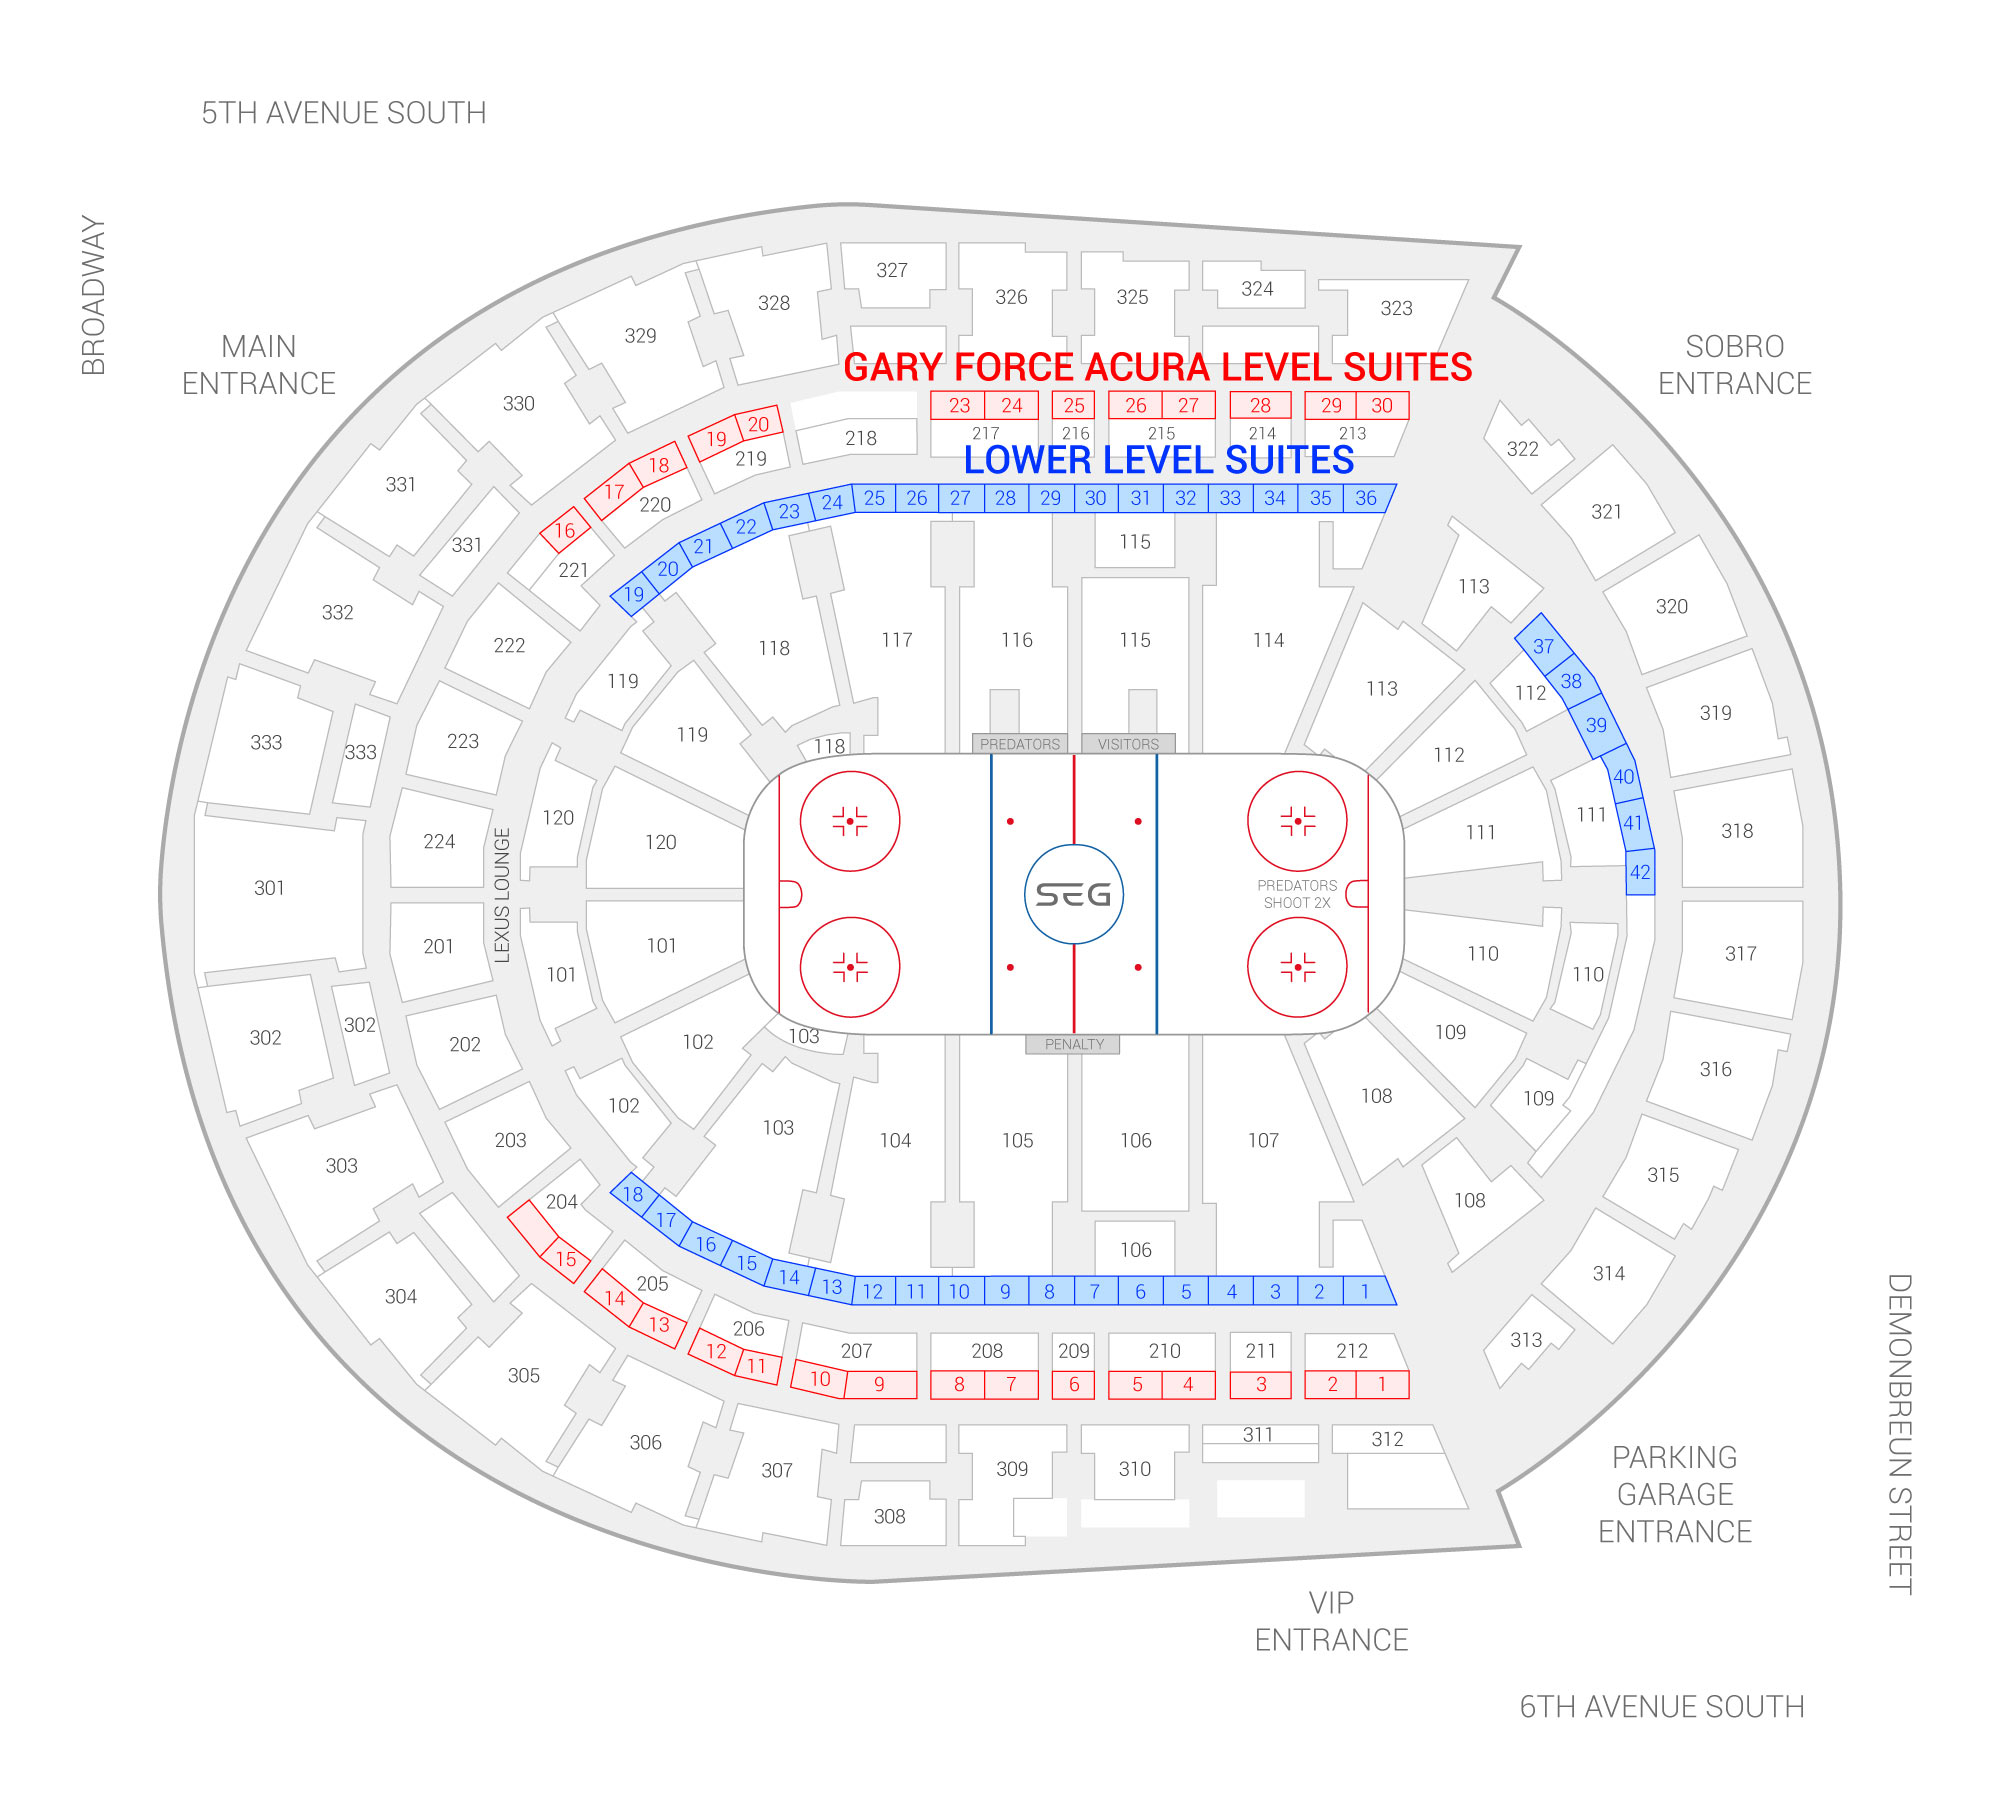 Bridgestone Arena / Nashville Predators Suite Map and Seating Chart